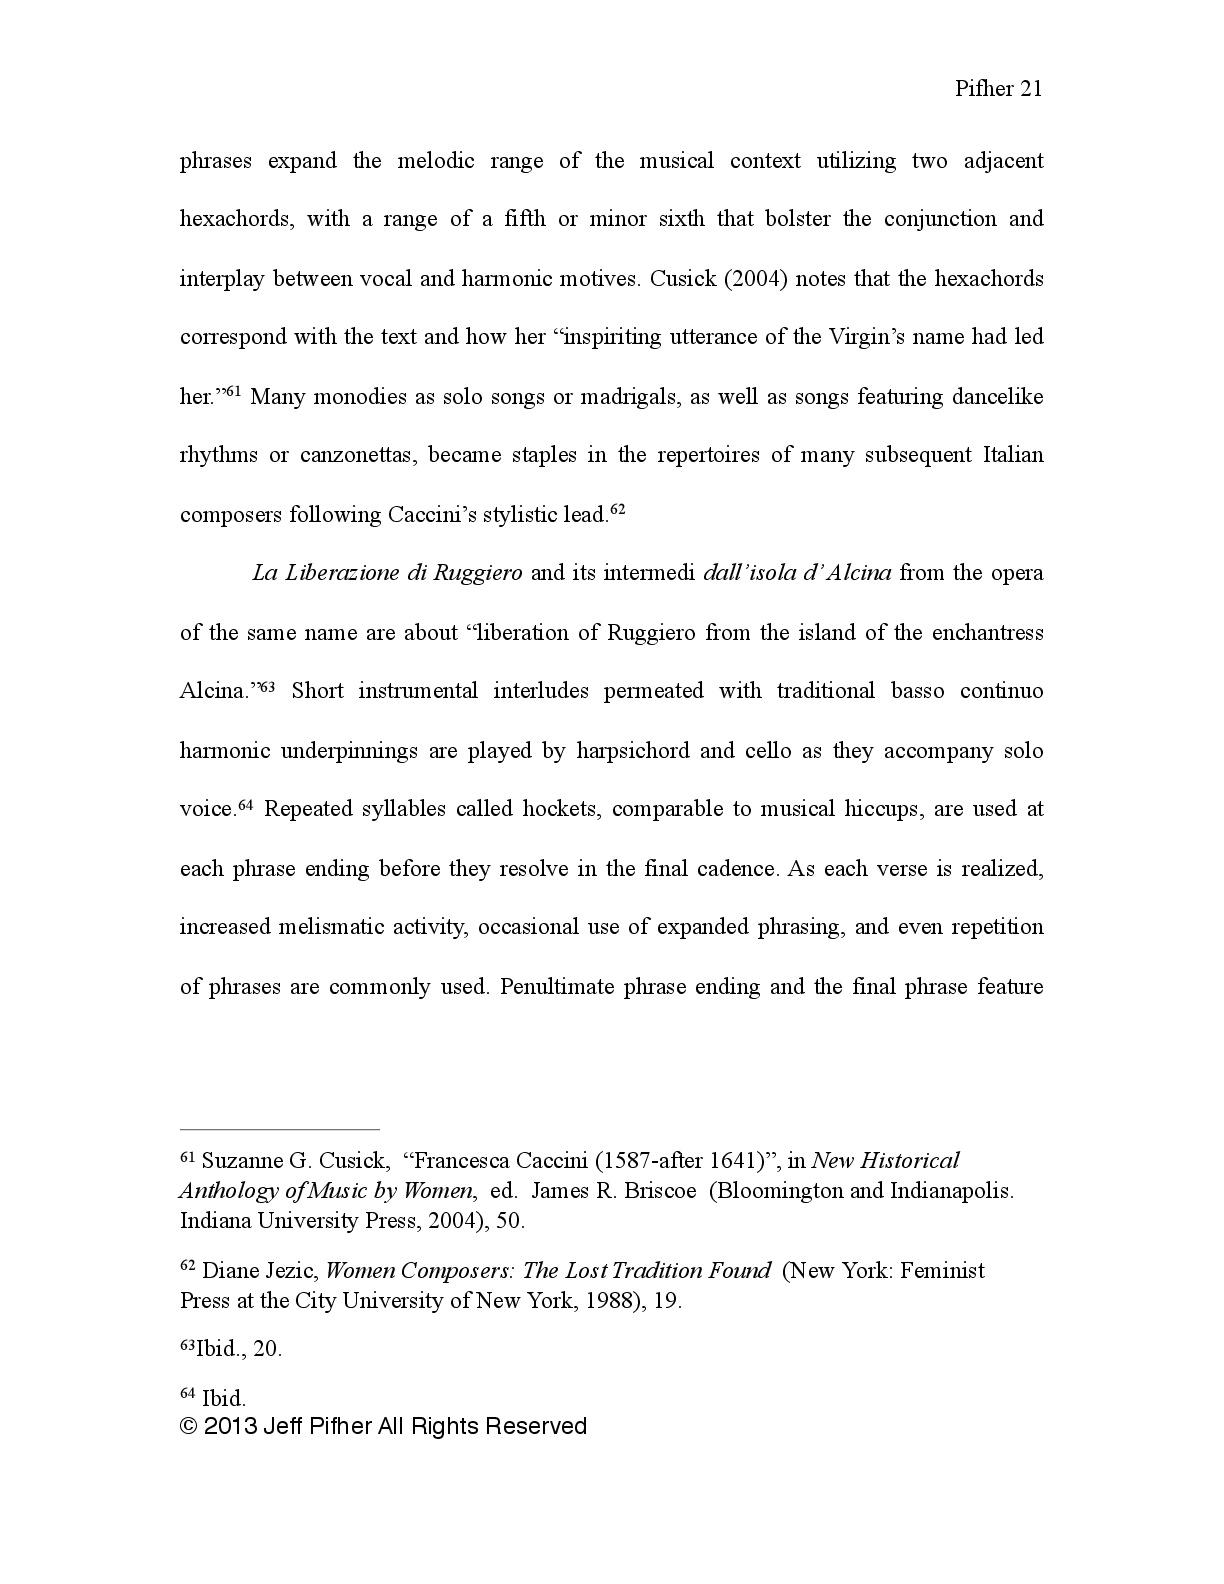 Jeff-Pifher-Music-and-Mediciean-Influences-(Academic-Series)-021.jpg